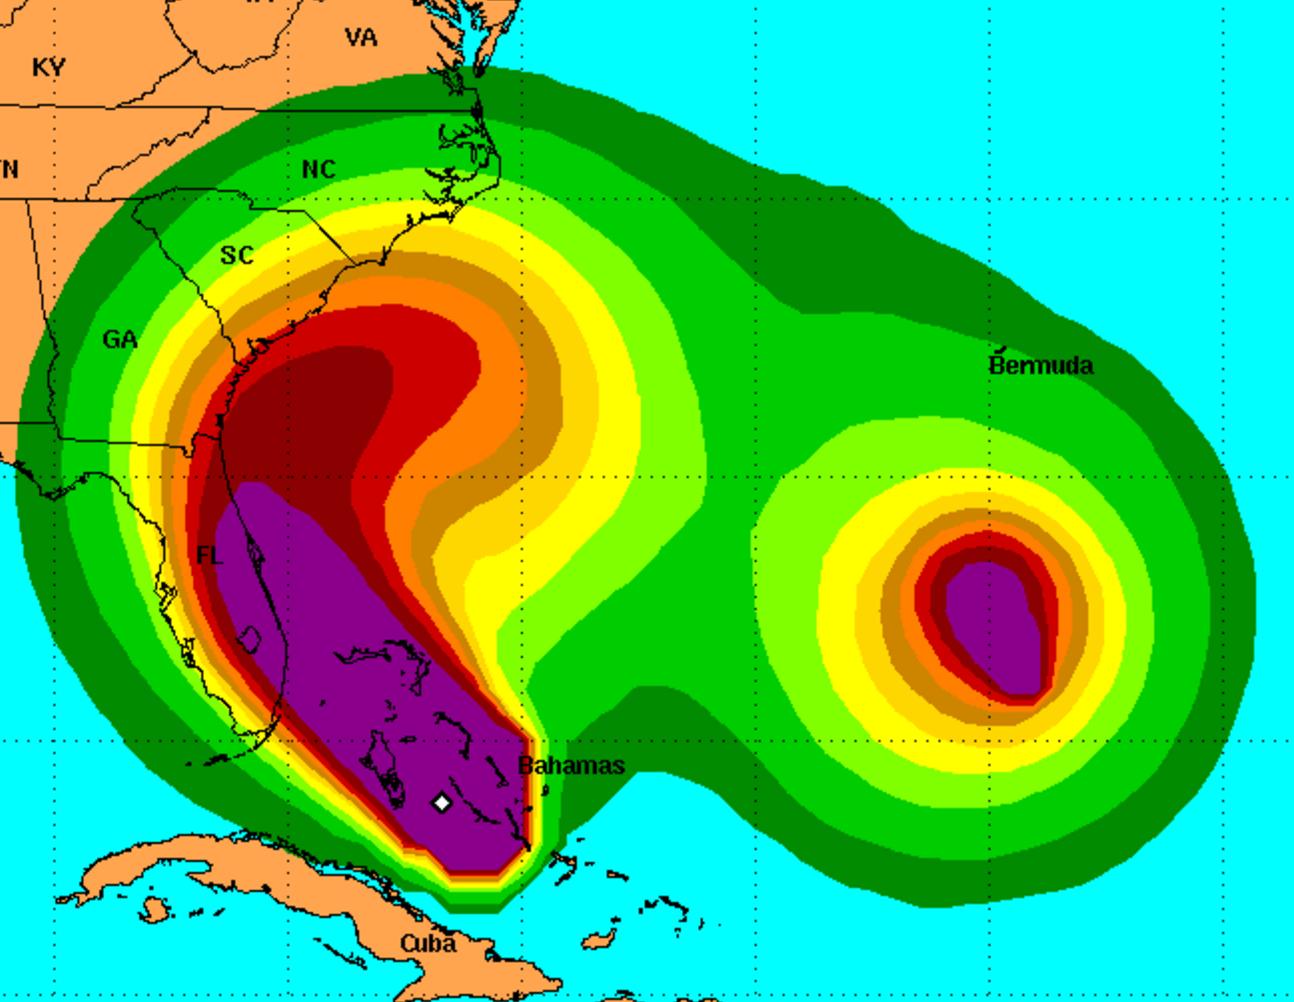 Hurricane Matthew Disney World Closures Cancellations Disney Tourist Blog Hurricane Matthew Tropical Storm Disney Tourist Blog